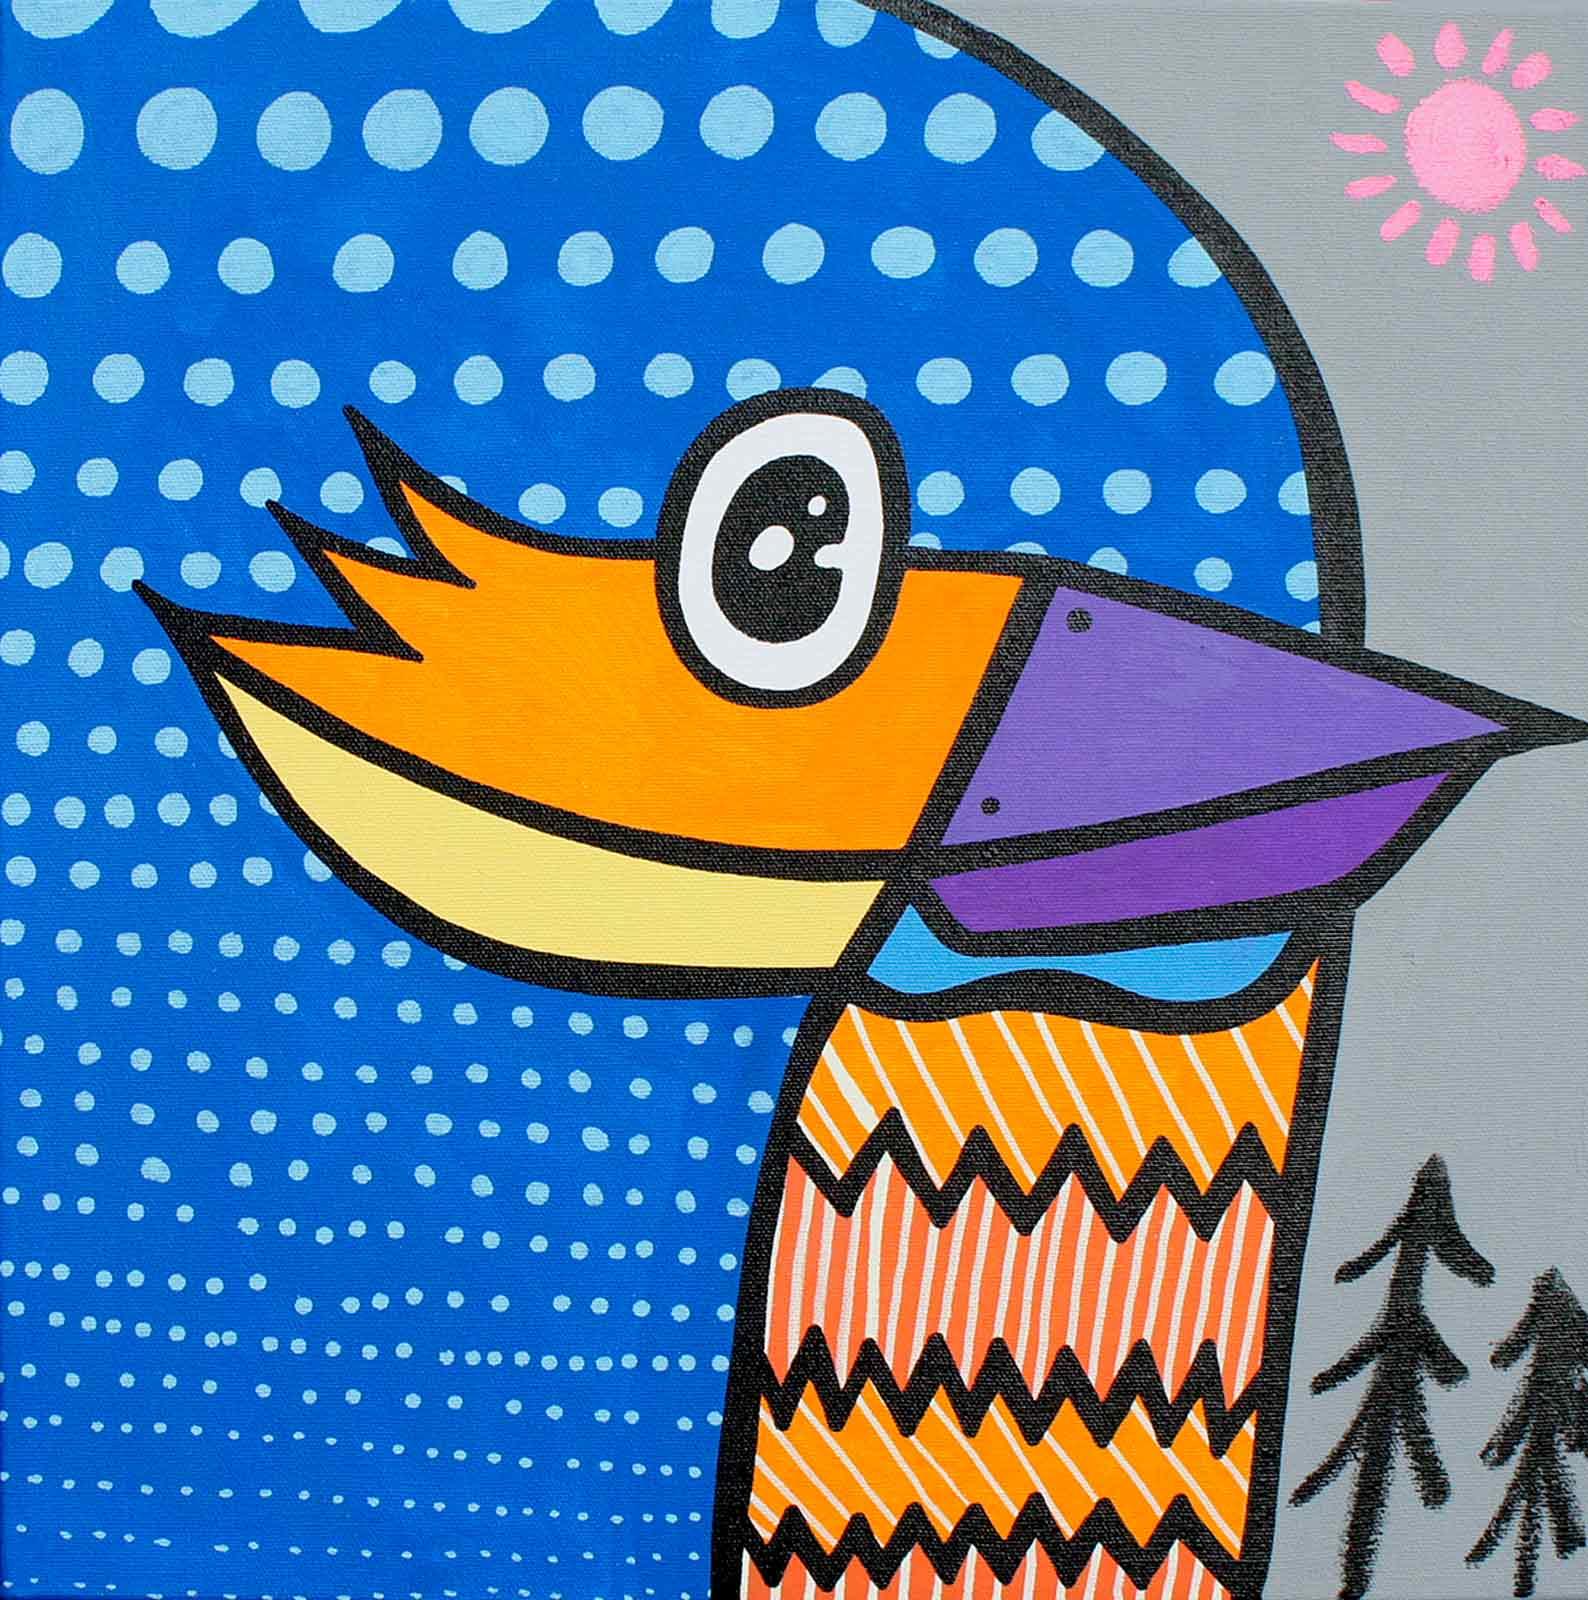 The Kingfisher, Kev Munday